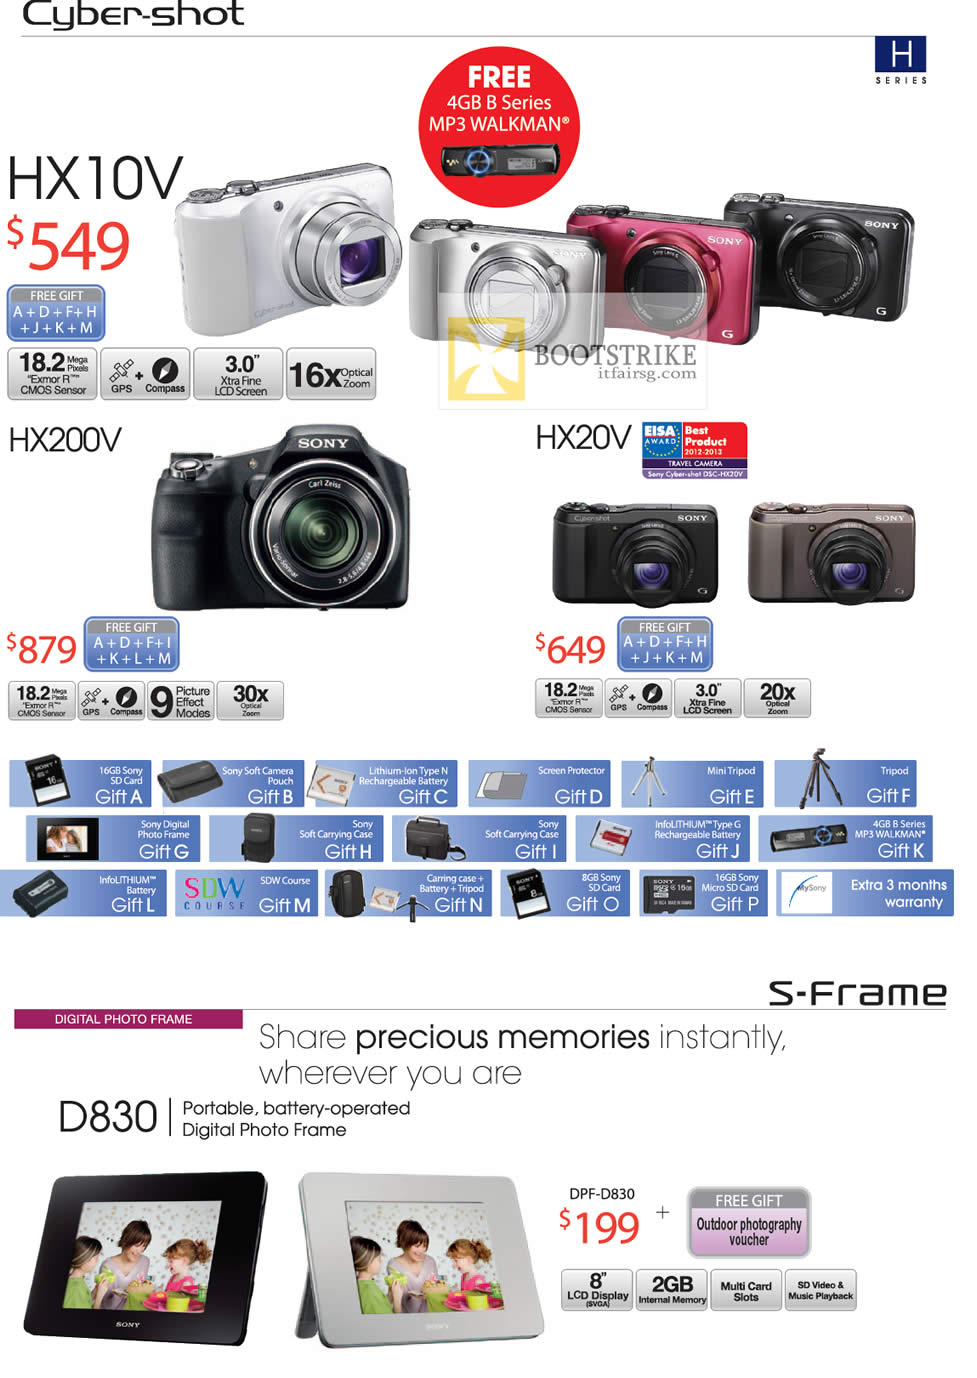 COMEX 2012 price list image brochure of Sony Cybershot Digital Cameras DSC HX10V, HX200V, HX20V, Digital Photo Frame DPF-D830